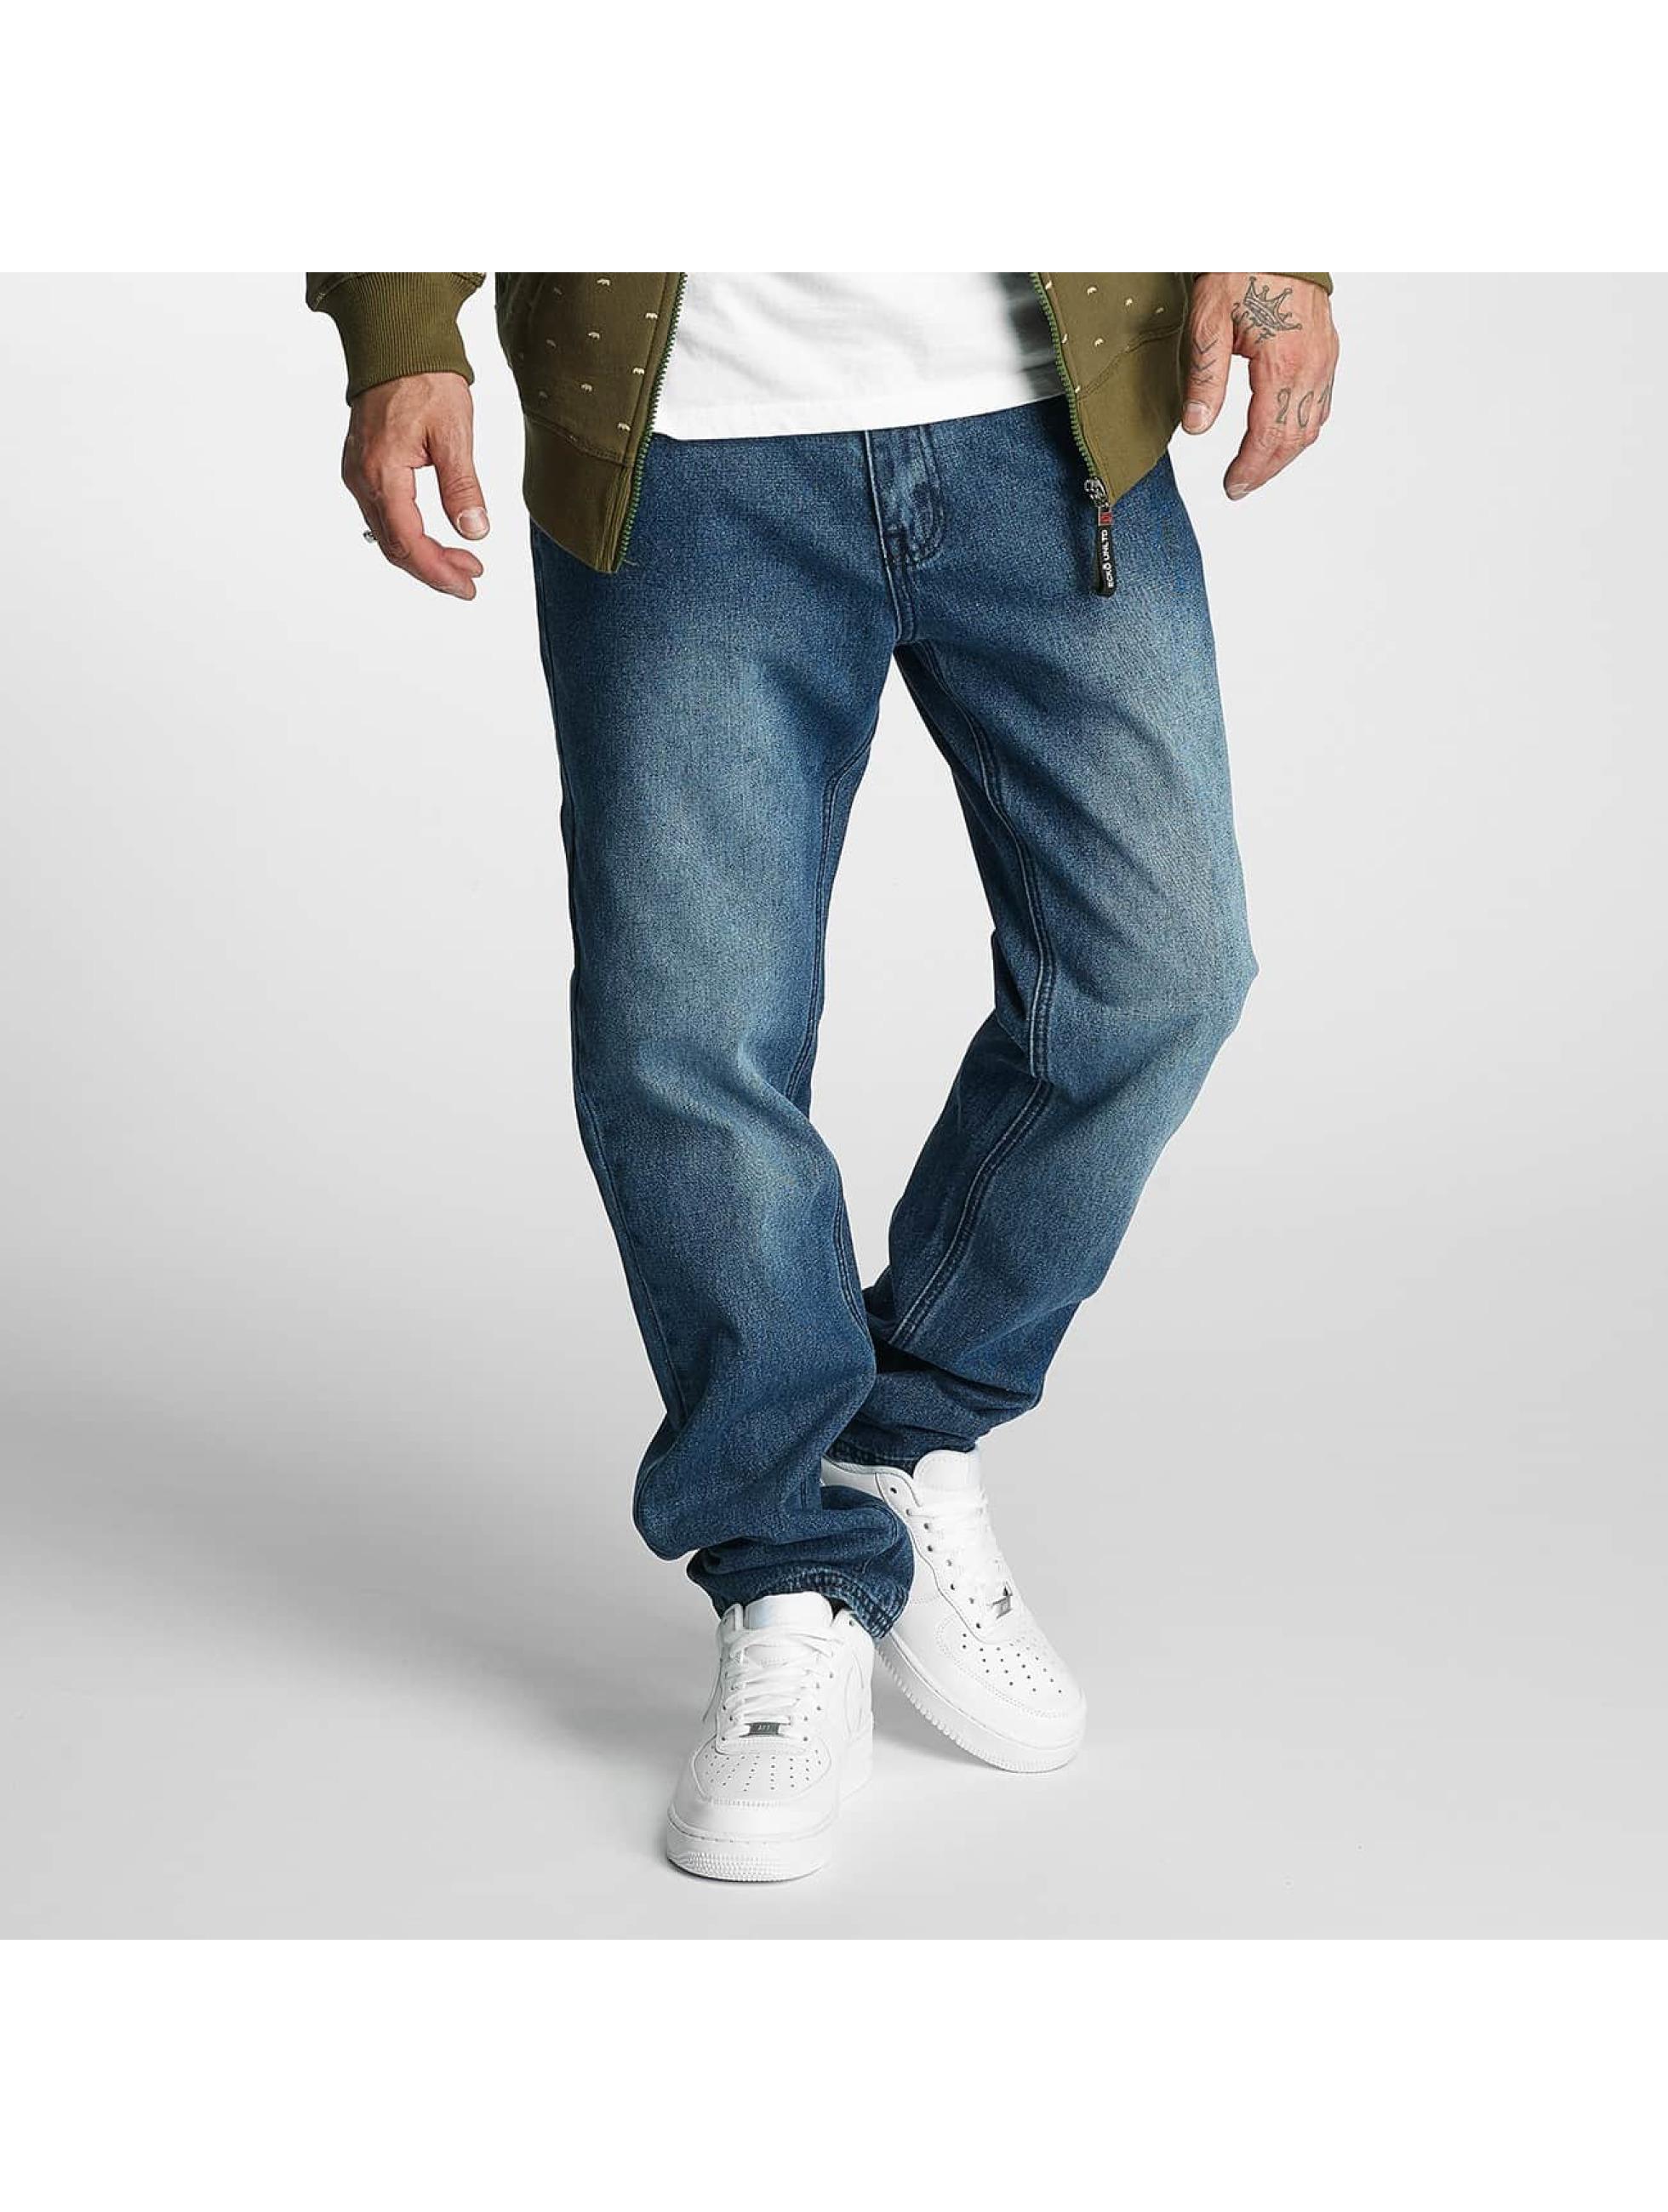 Ecko Unltd. / Loose Fit Jeans Kamino in blue W 32 L 32